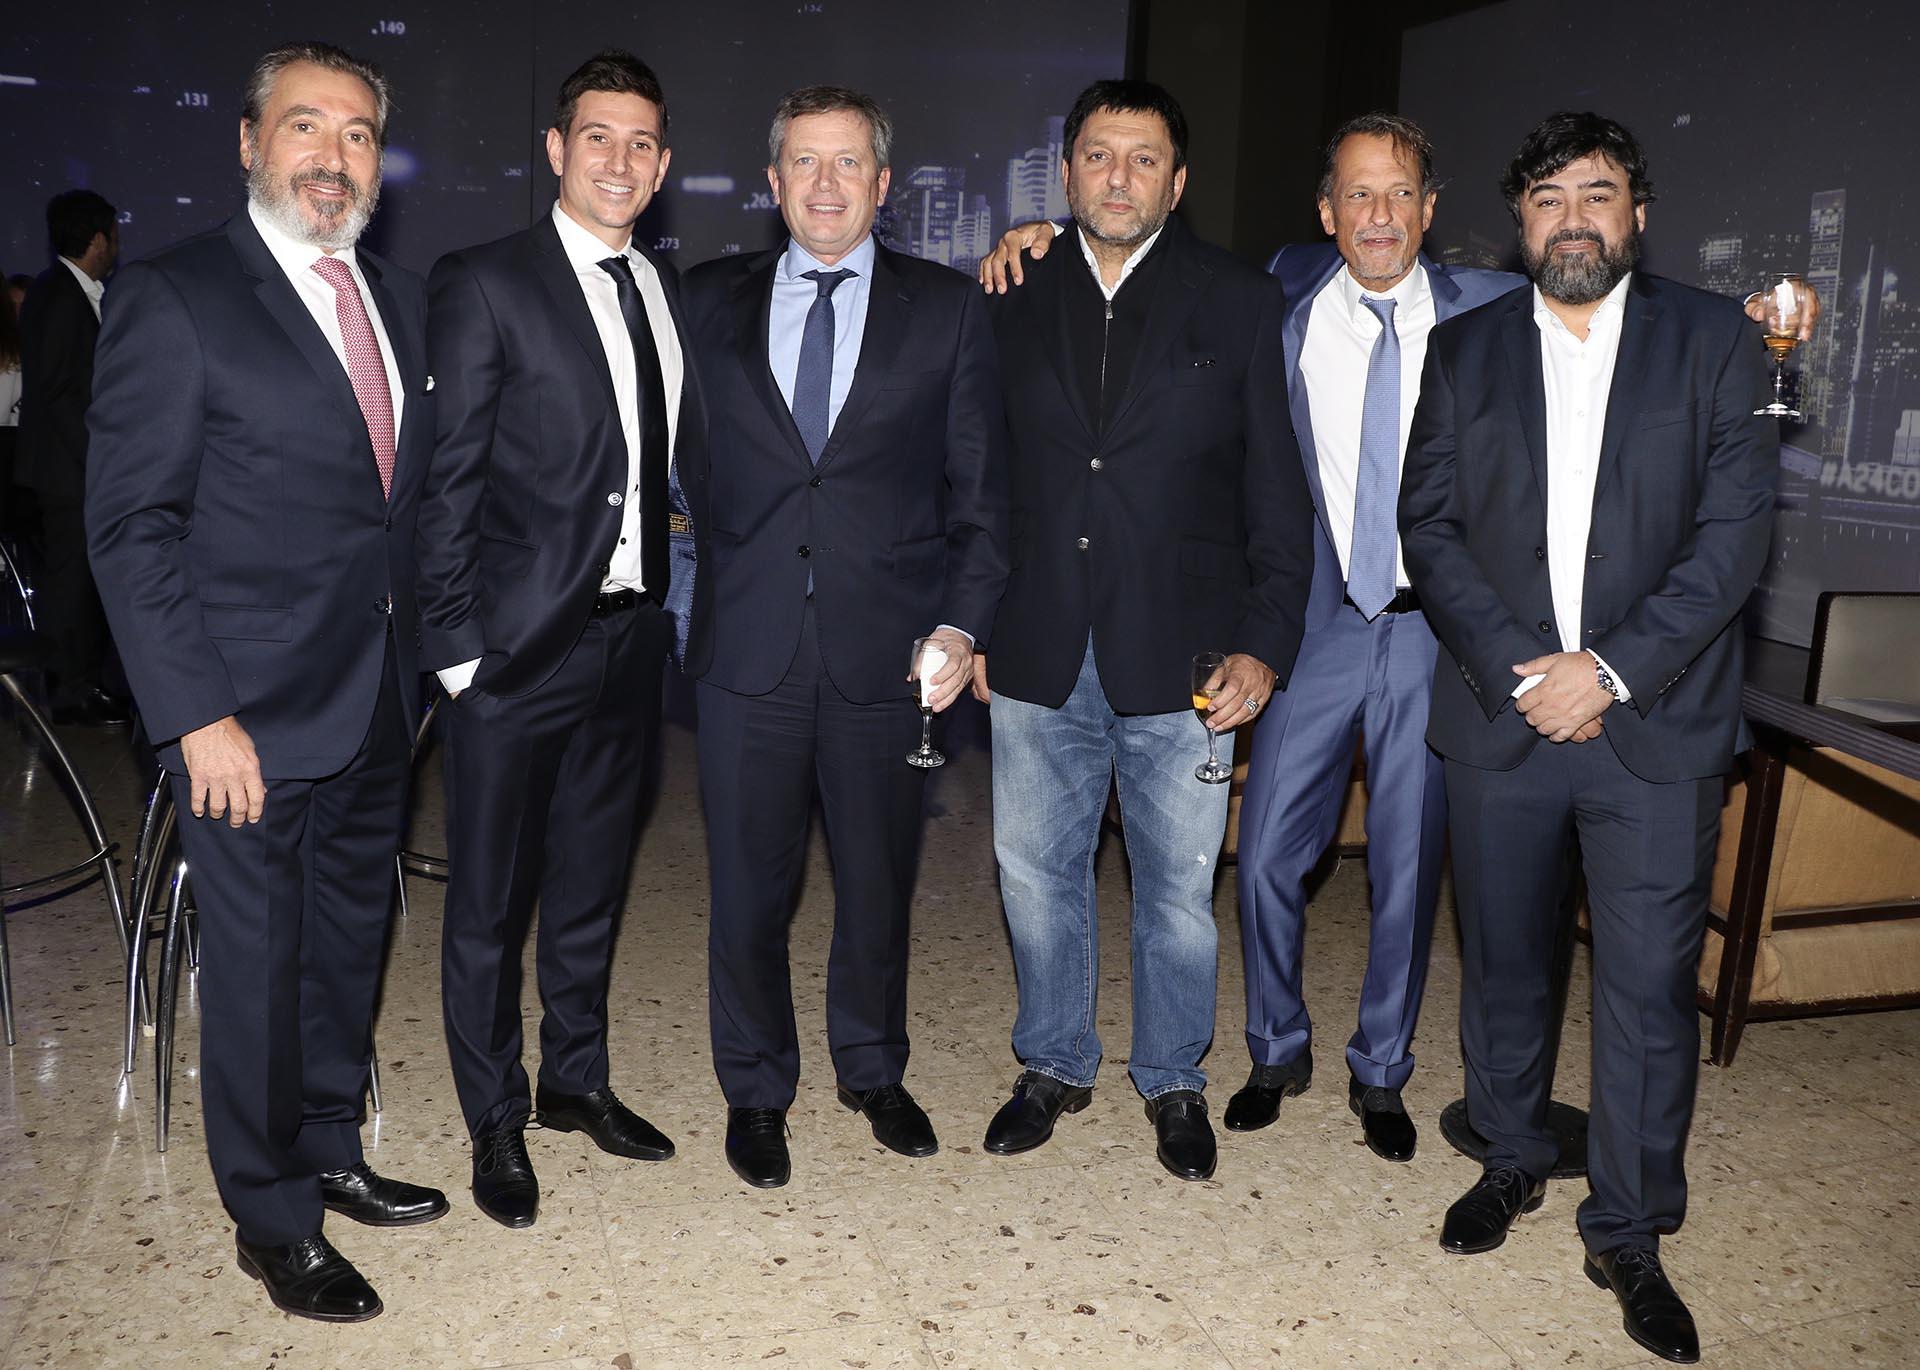 Daniel Vila, Agustín Vila, Emilio Monzó, Gabriel Hochbaum, Claudio Belocopitt y Juan Cruz Ávila